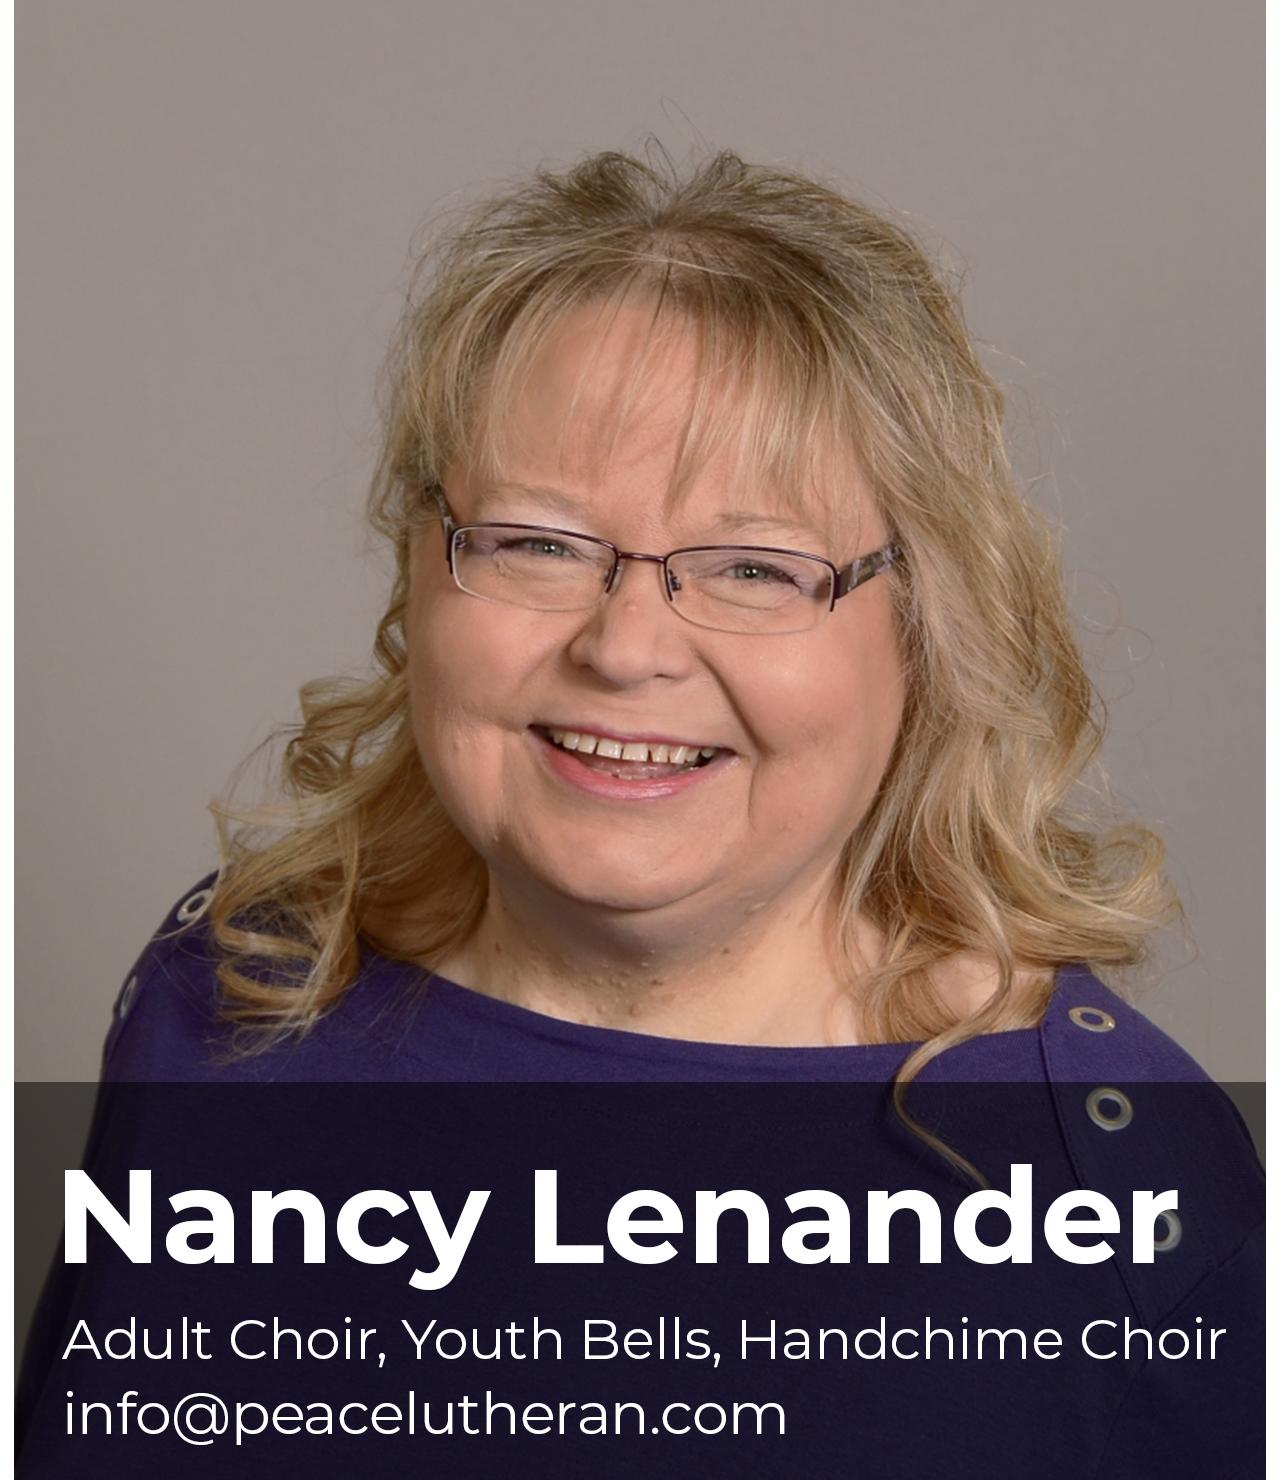 Nancy Lendander